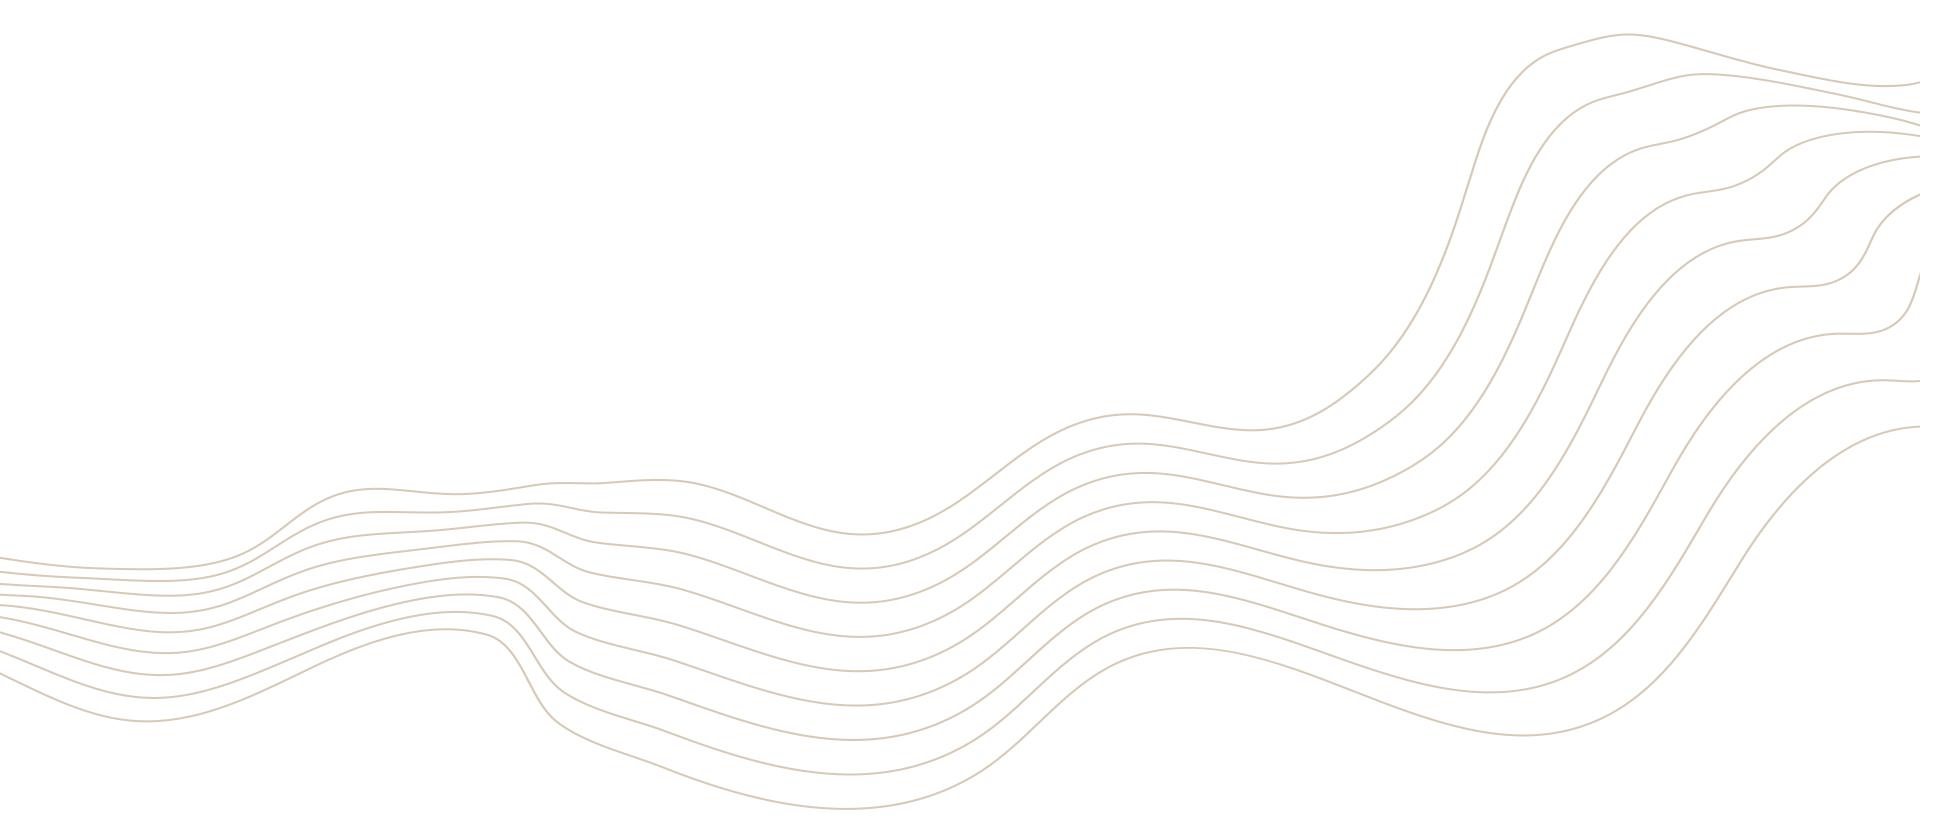 work-line-1